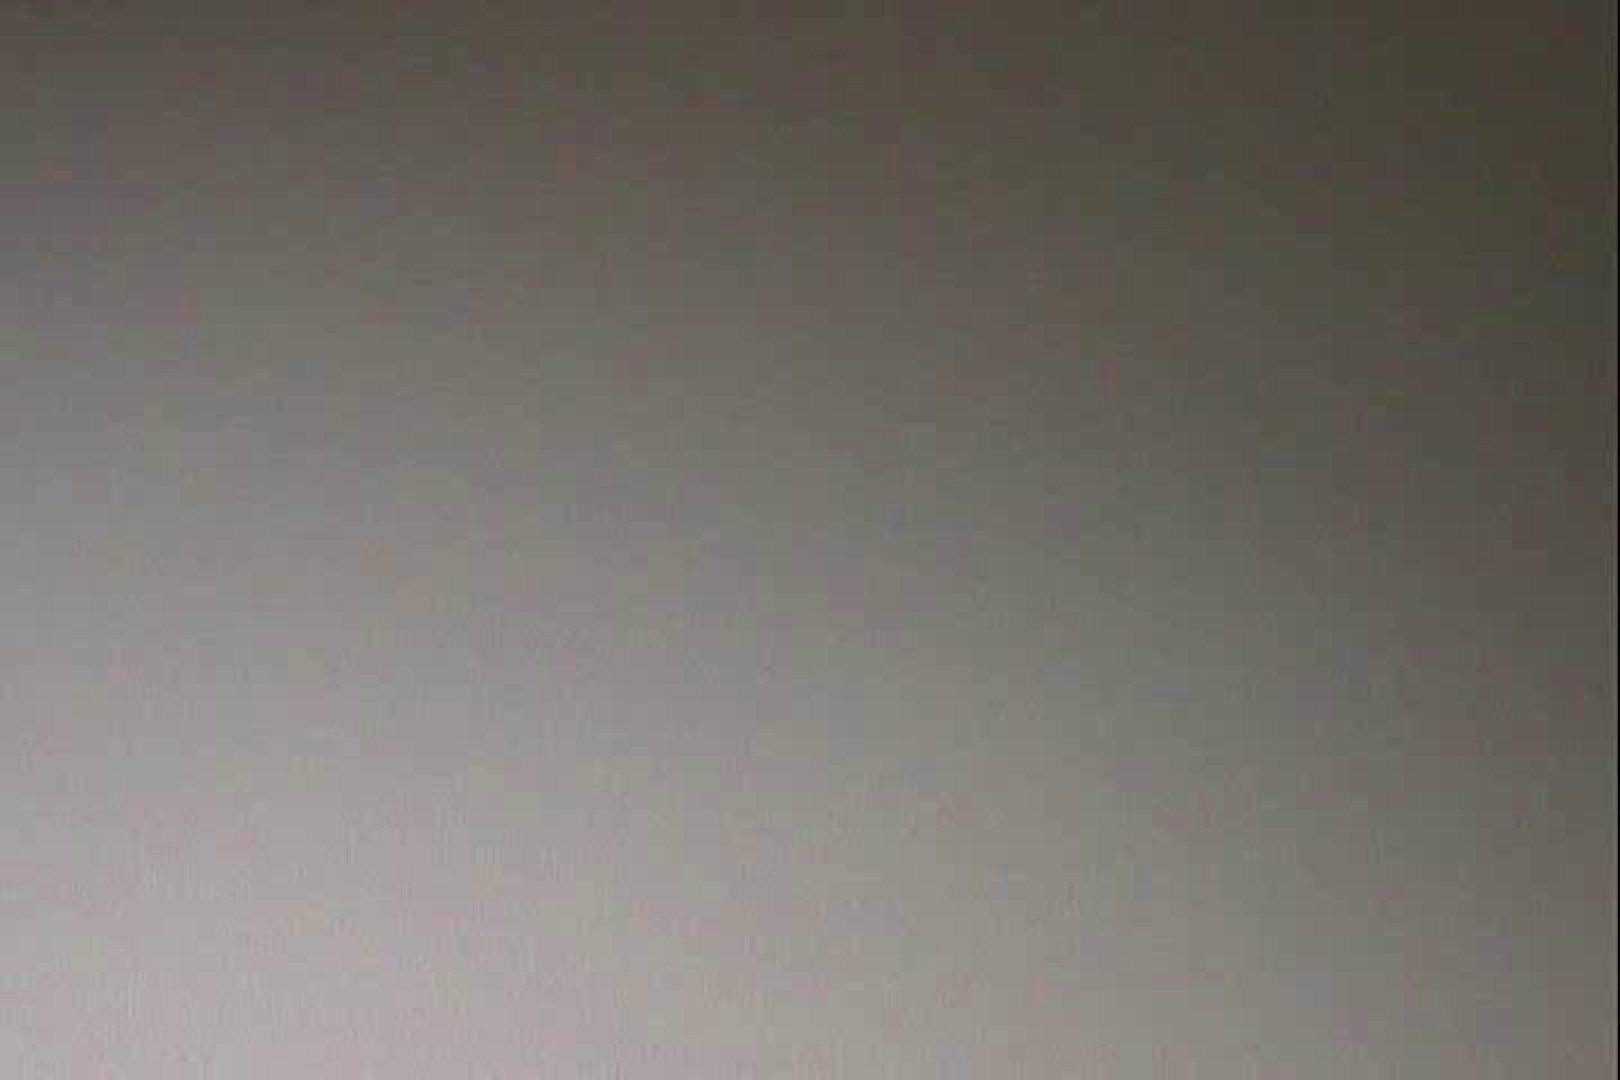 激撮!! 接写天井裏の刺客Vol.4 露天 | 覗き放題  63画像 21